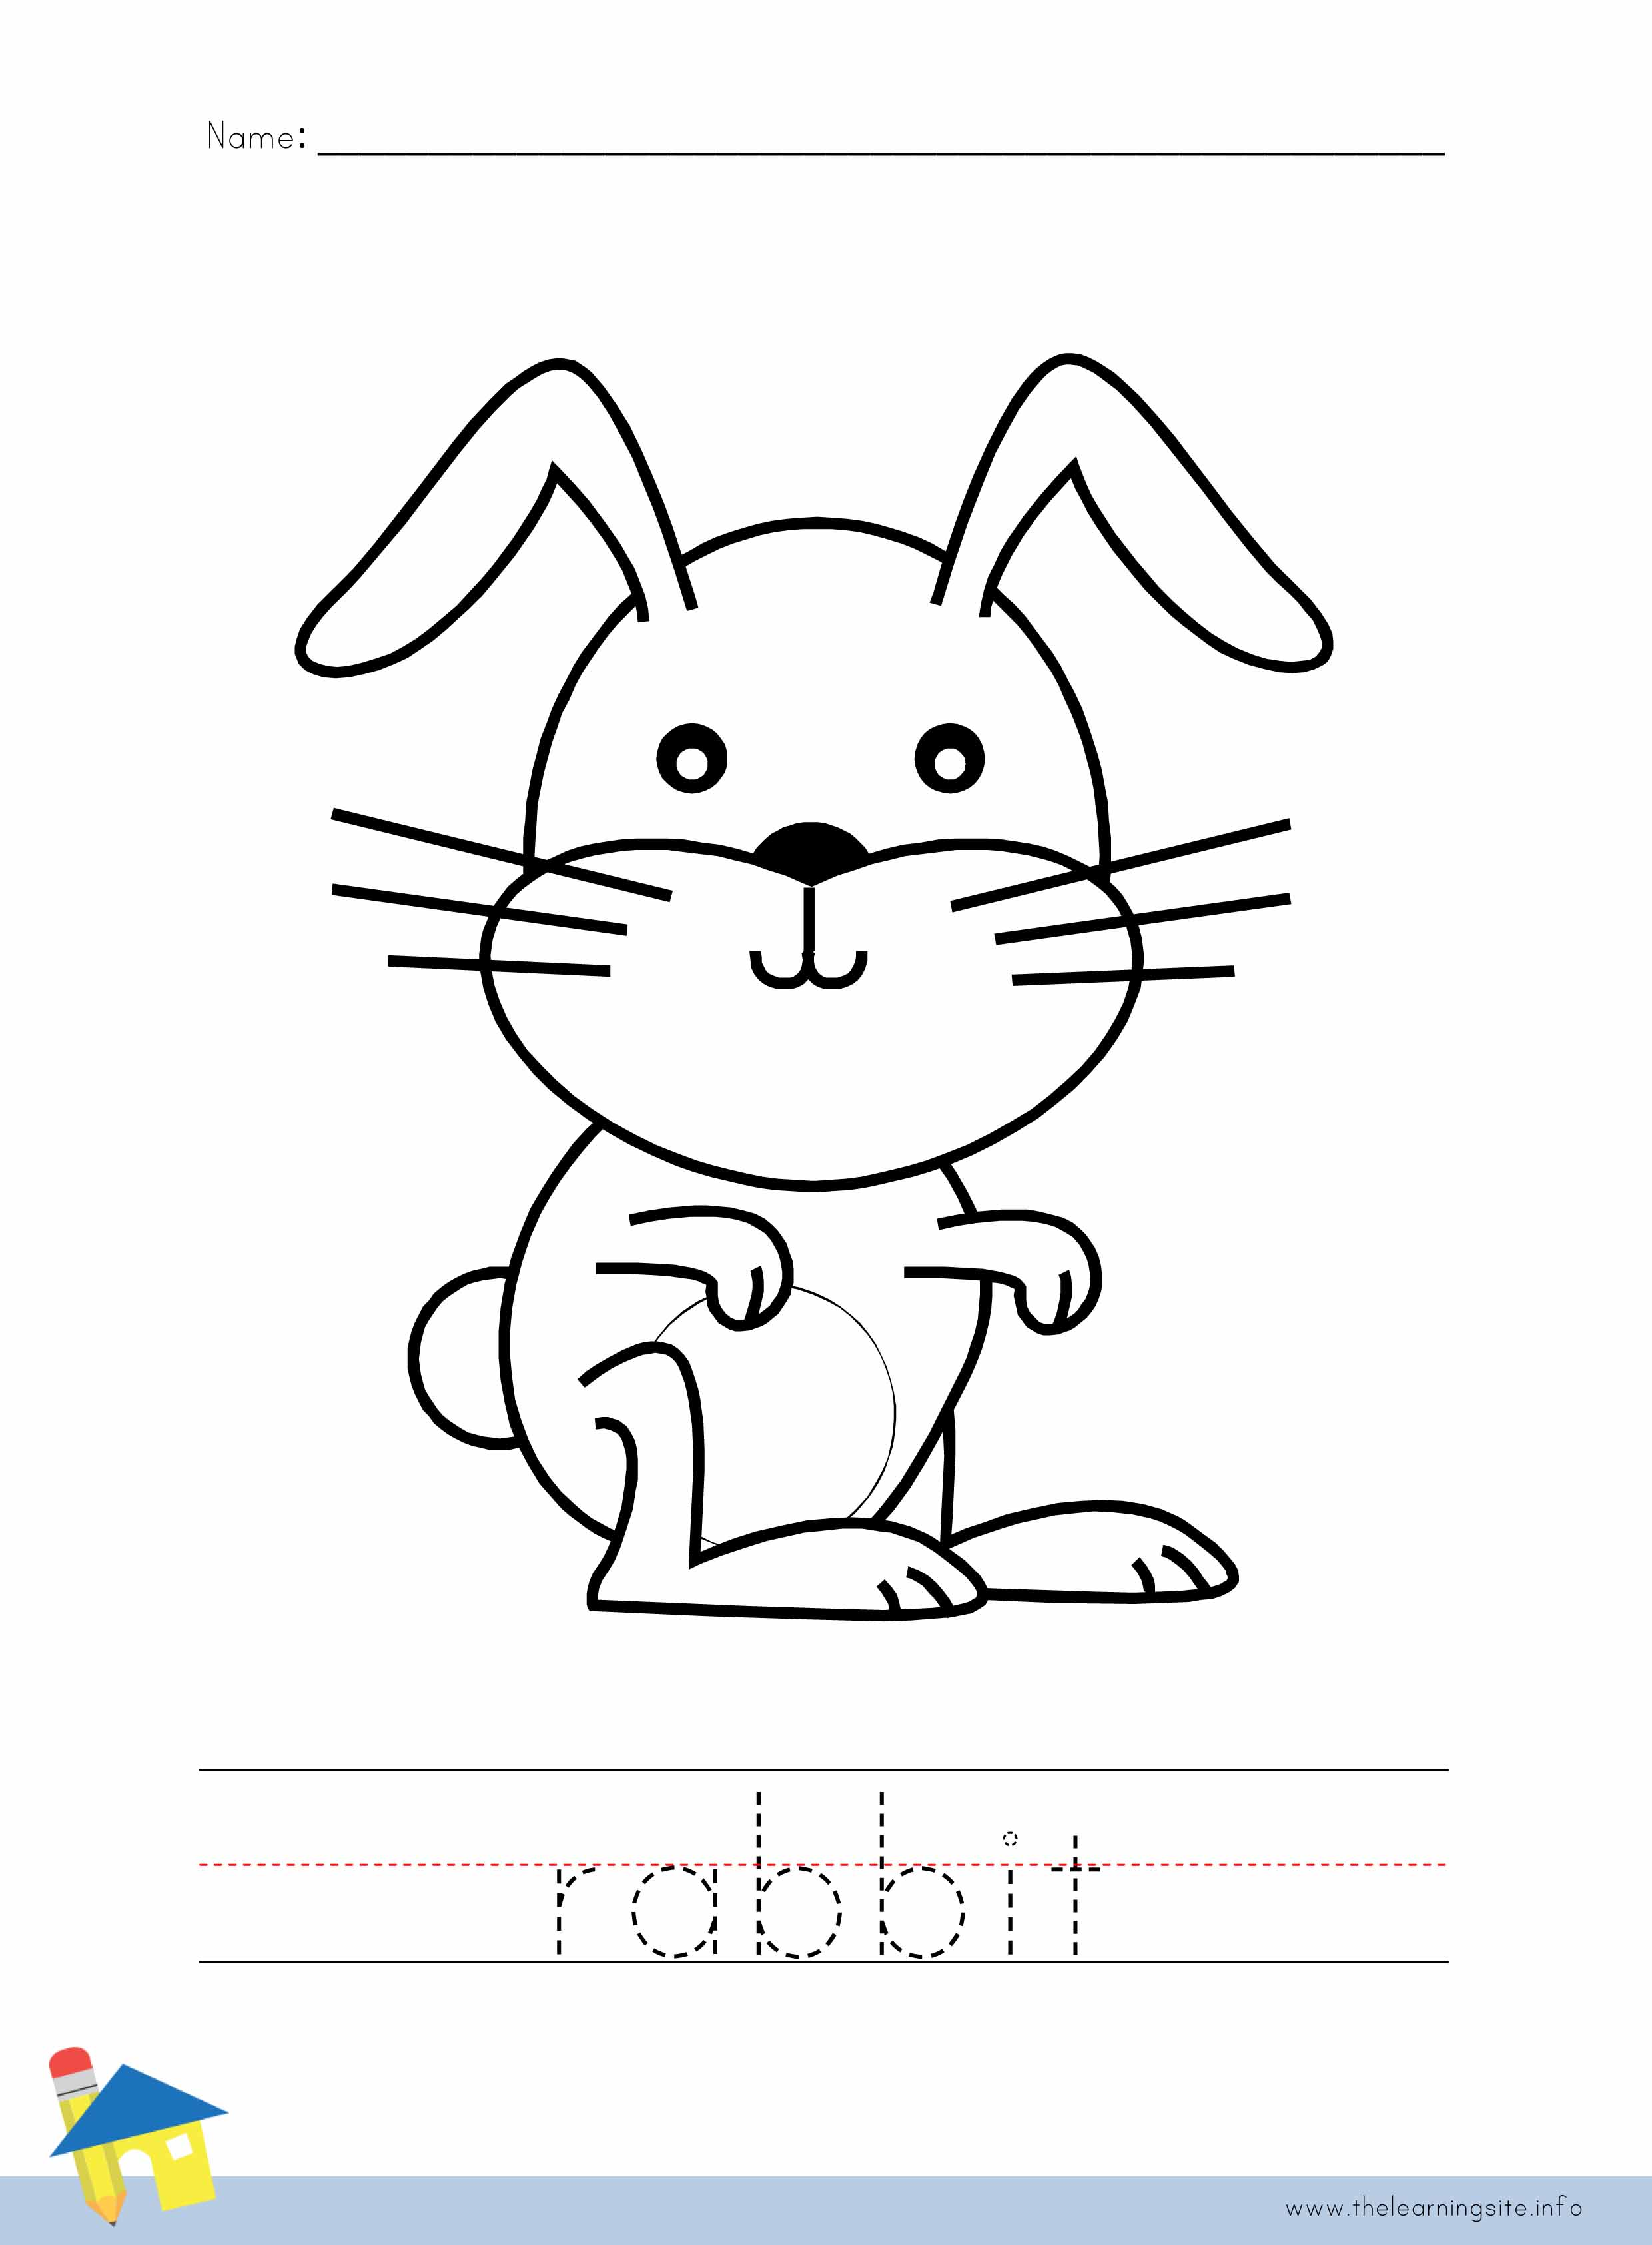 Rabbits eat carrots Worksheet - Twisty Noodle